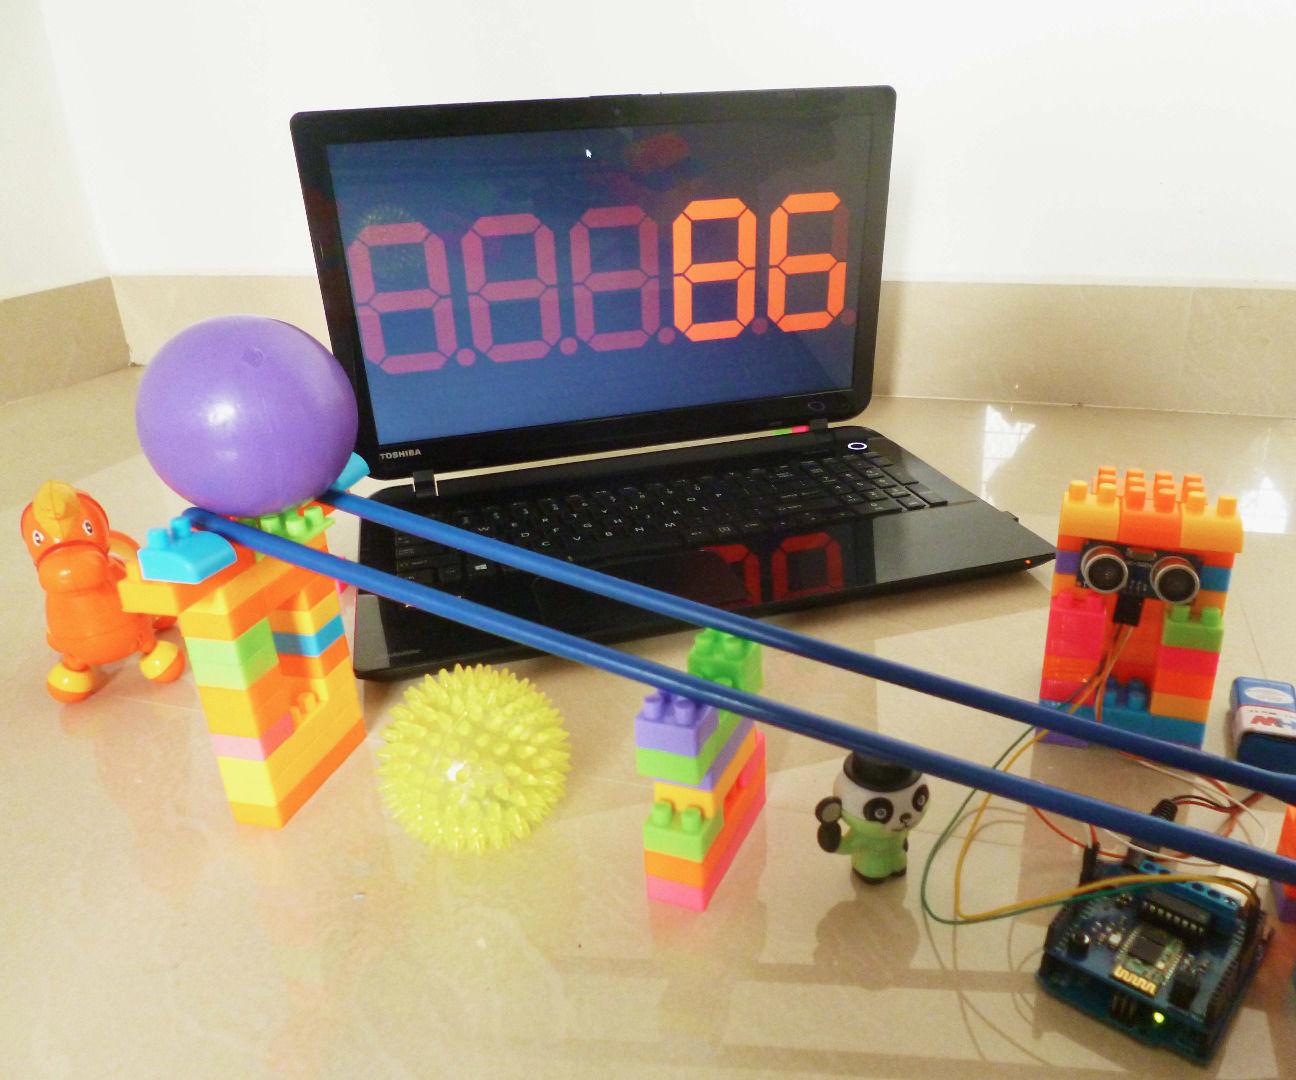 Fun counter with Bluetooth and Ultrasonic Sensor